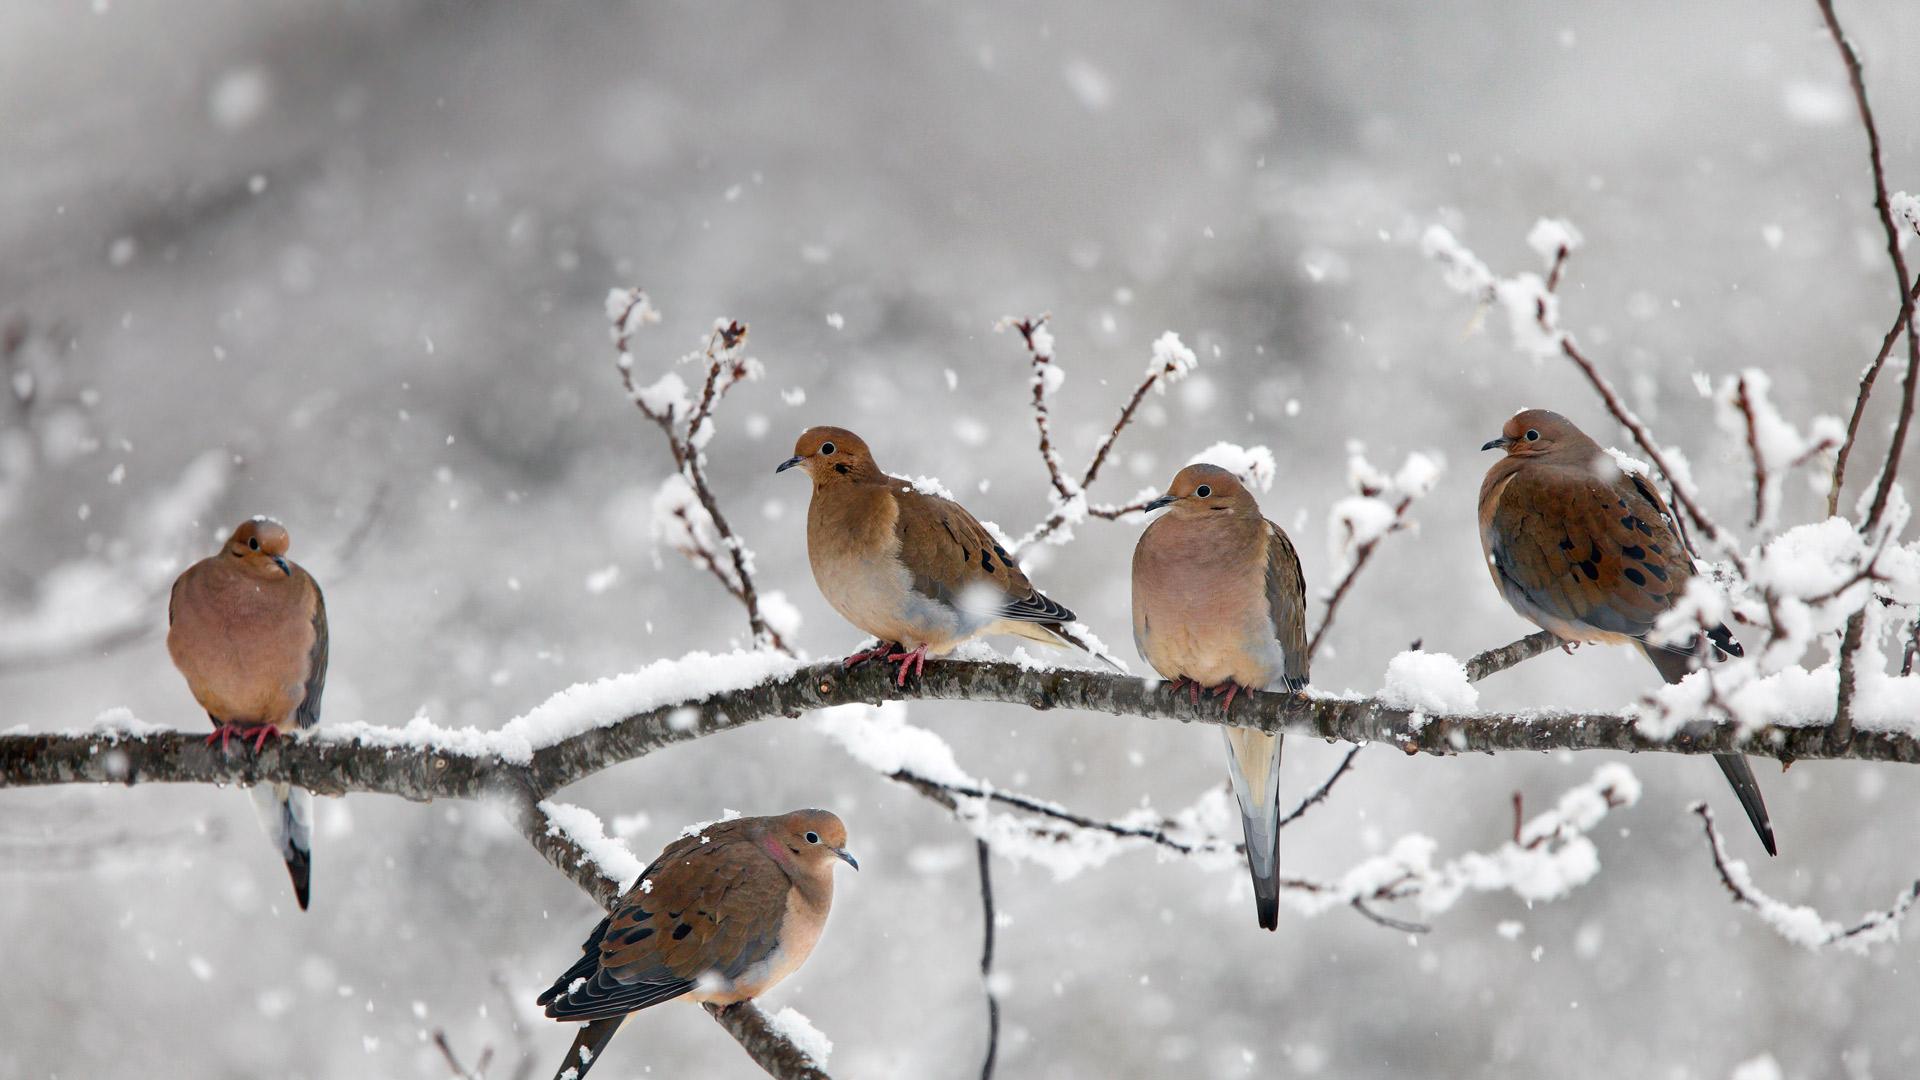 Mourning doves near Bear River, Nova Scotia, Canada (© Scott Leslie/Minden Pictures)